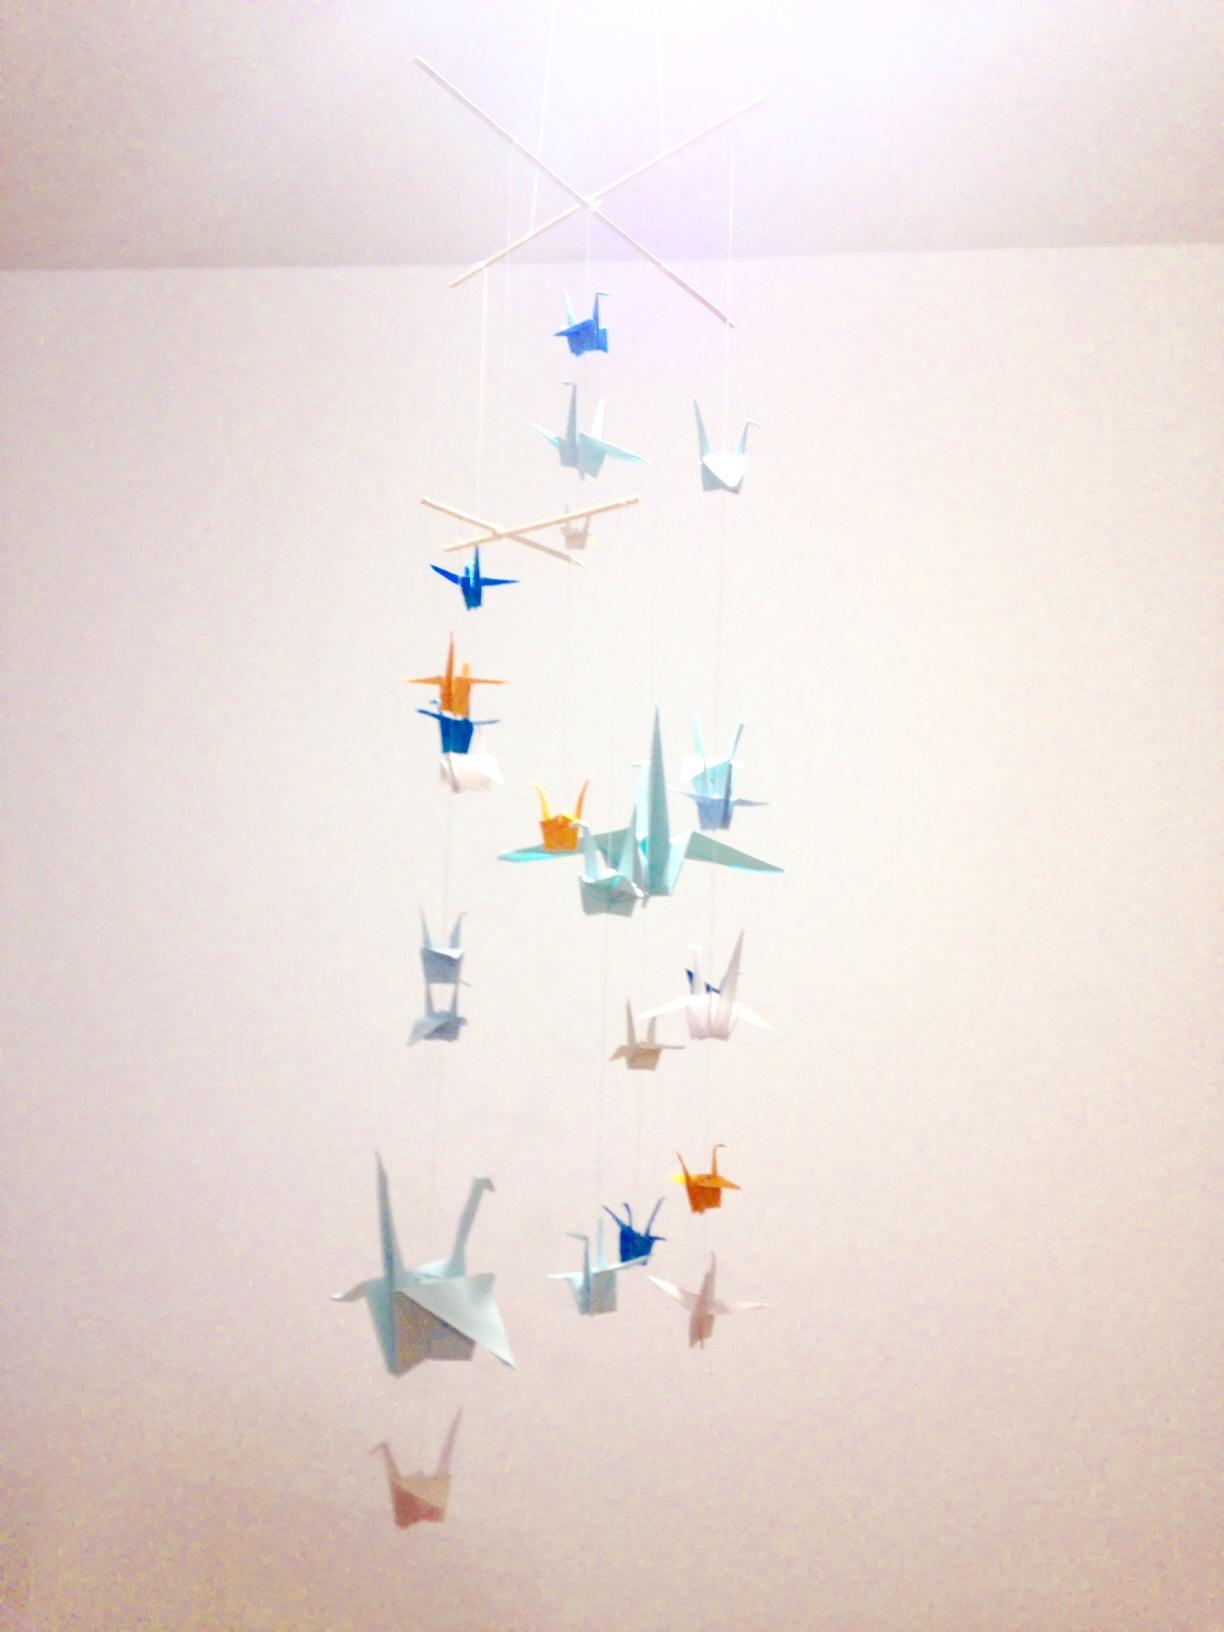 origami kranich mobile phil in wien. Black Bedroom Furniture Sets. Home Design Ideas